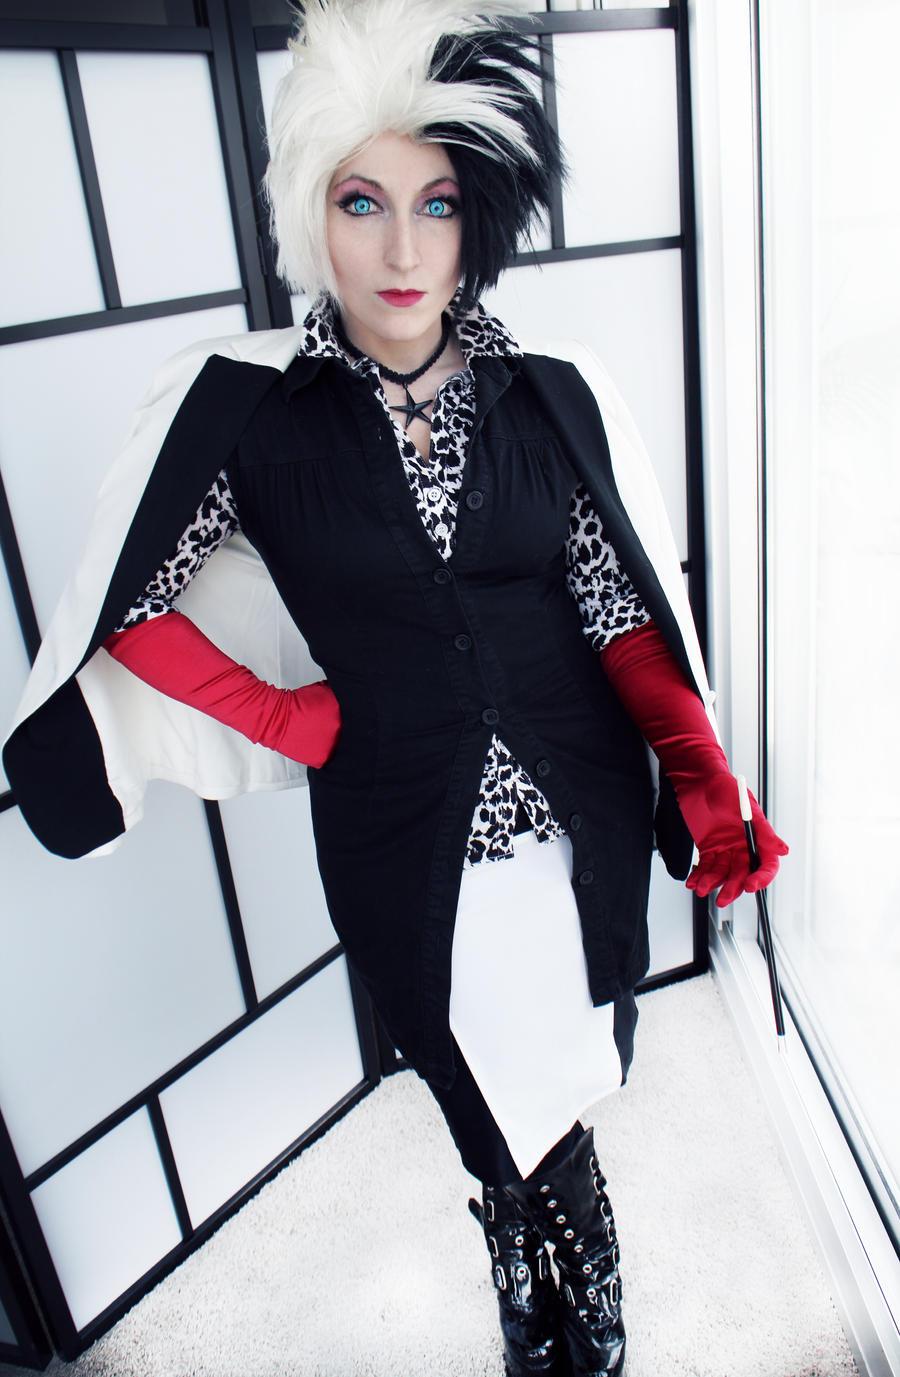 Cruella Deville by GingerAnneLondon